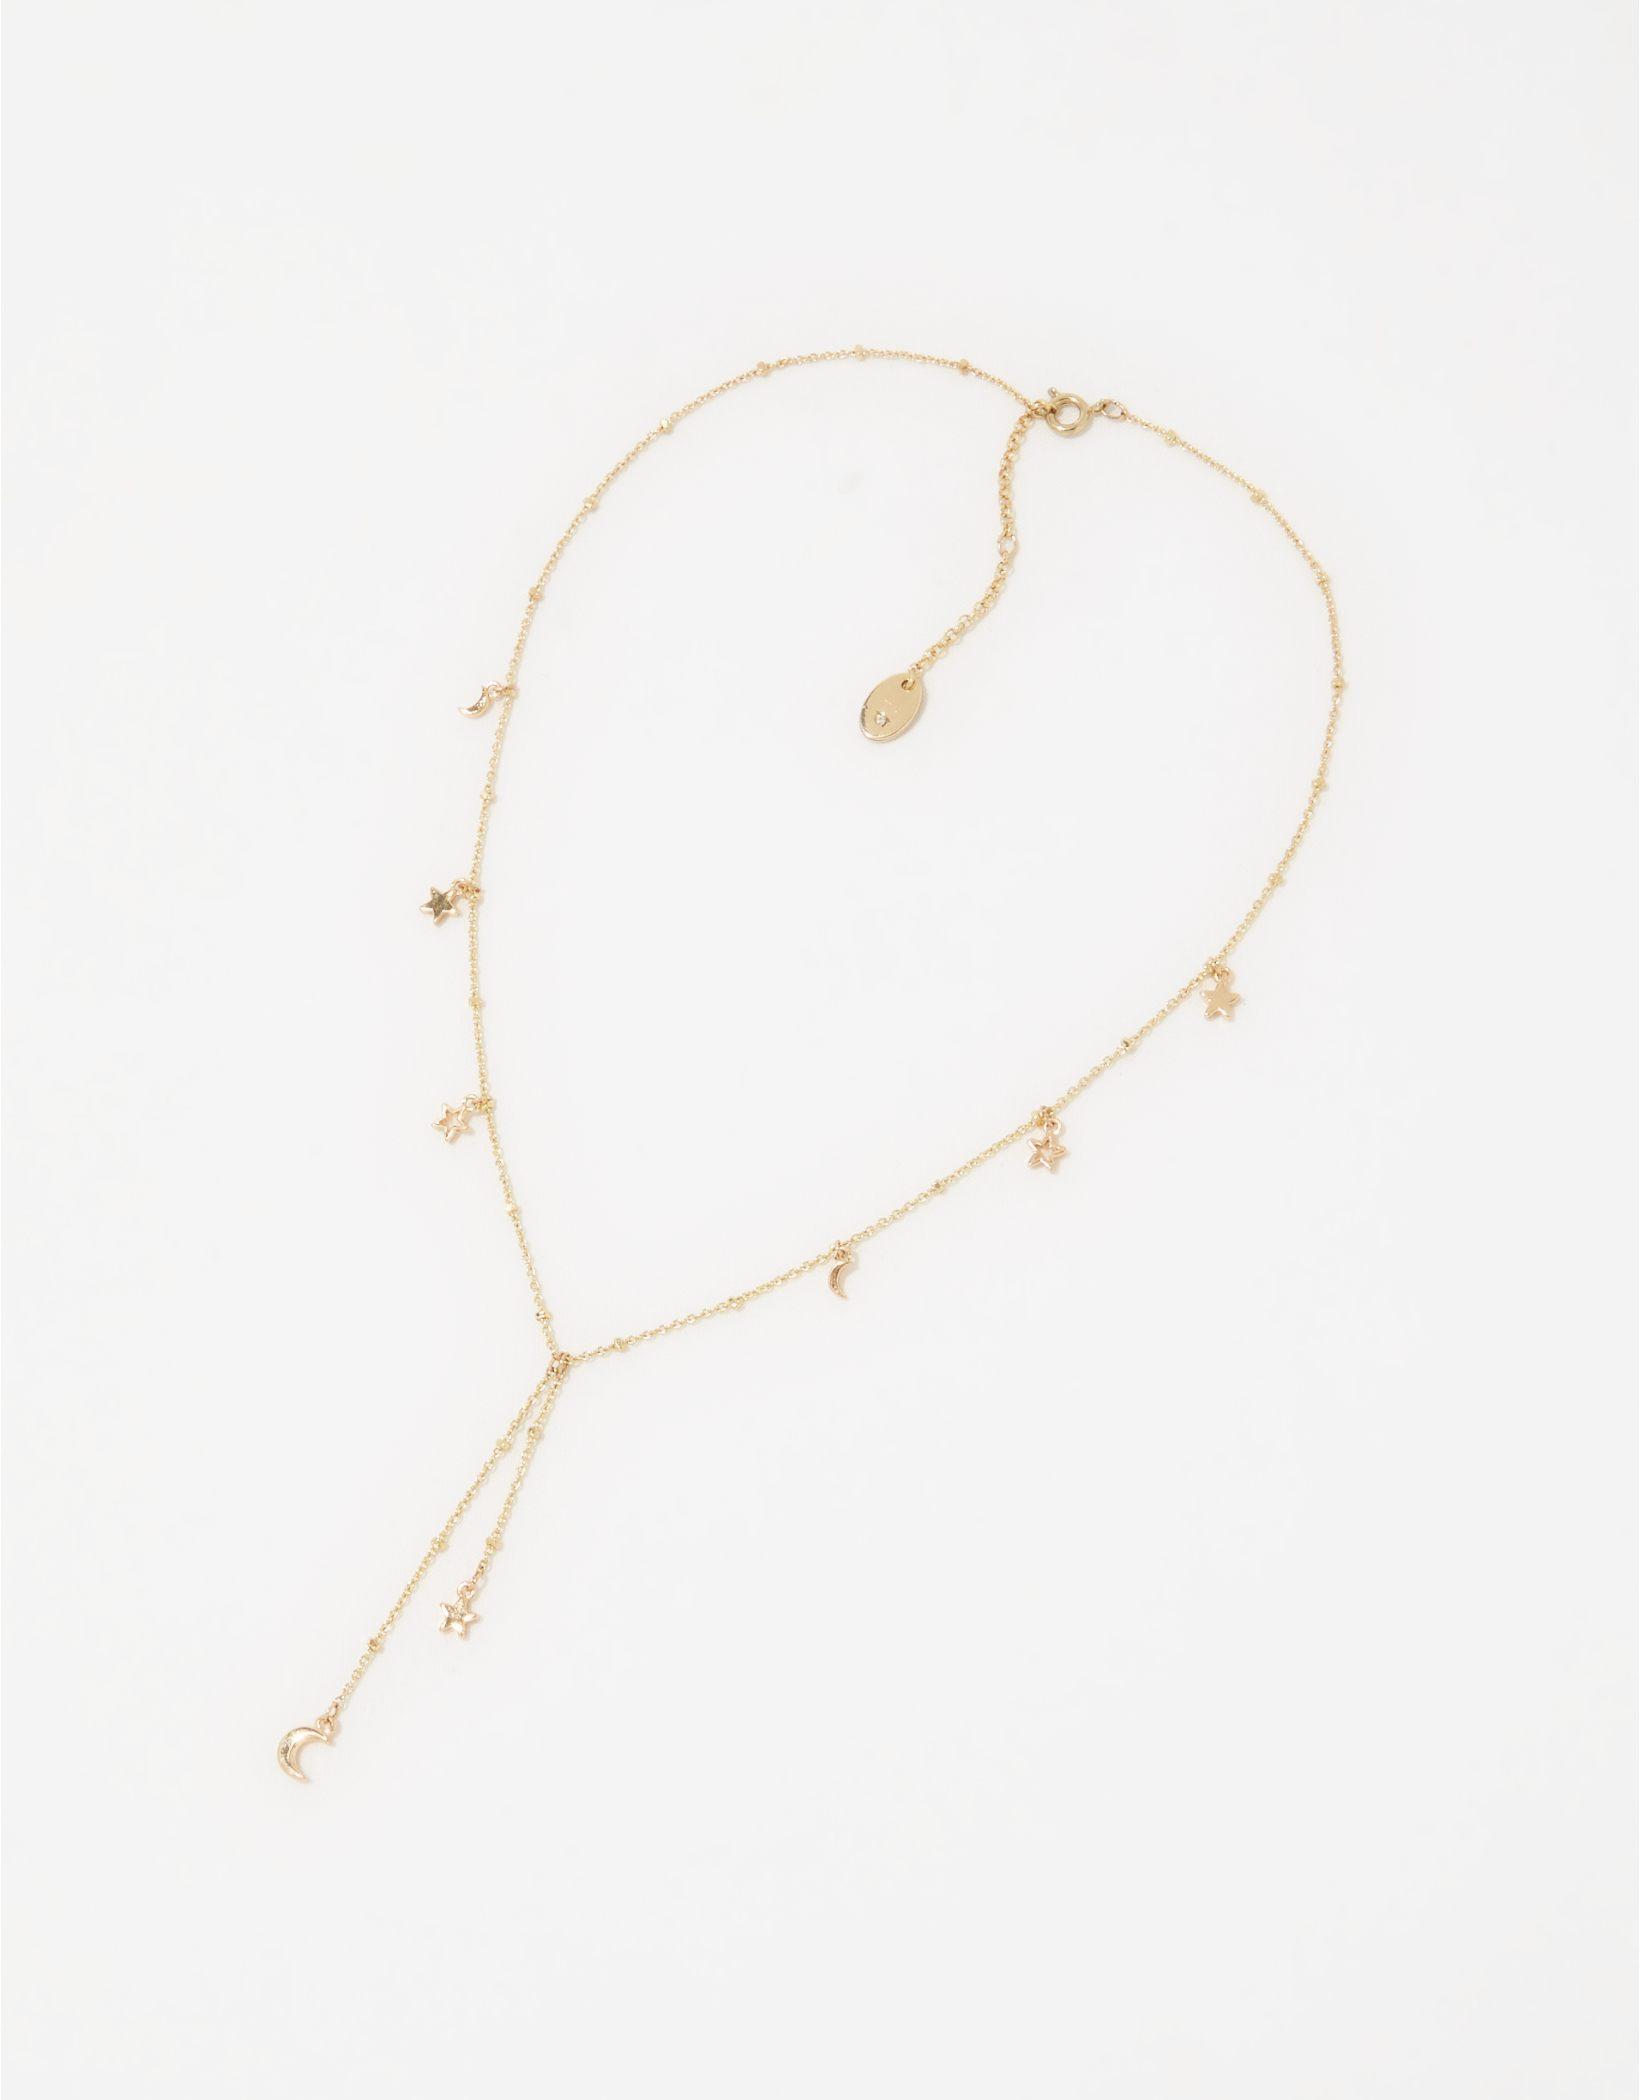 Aerie Celestial Charm Necklace